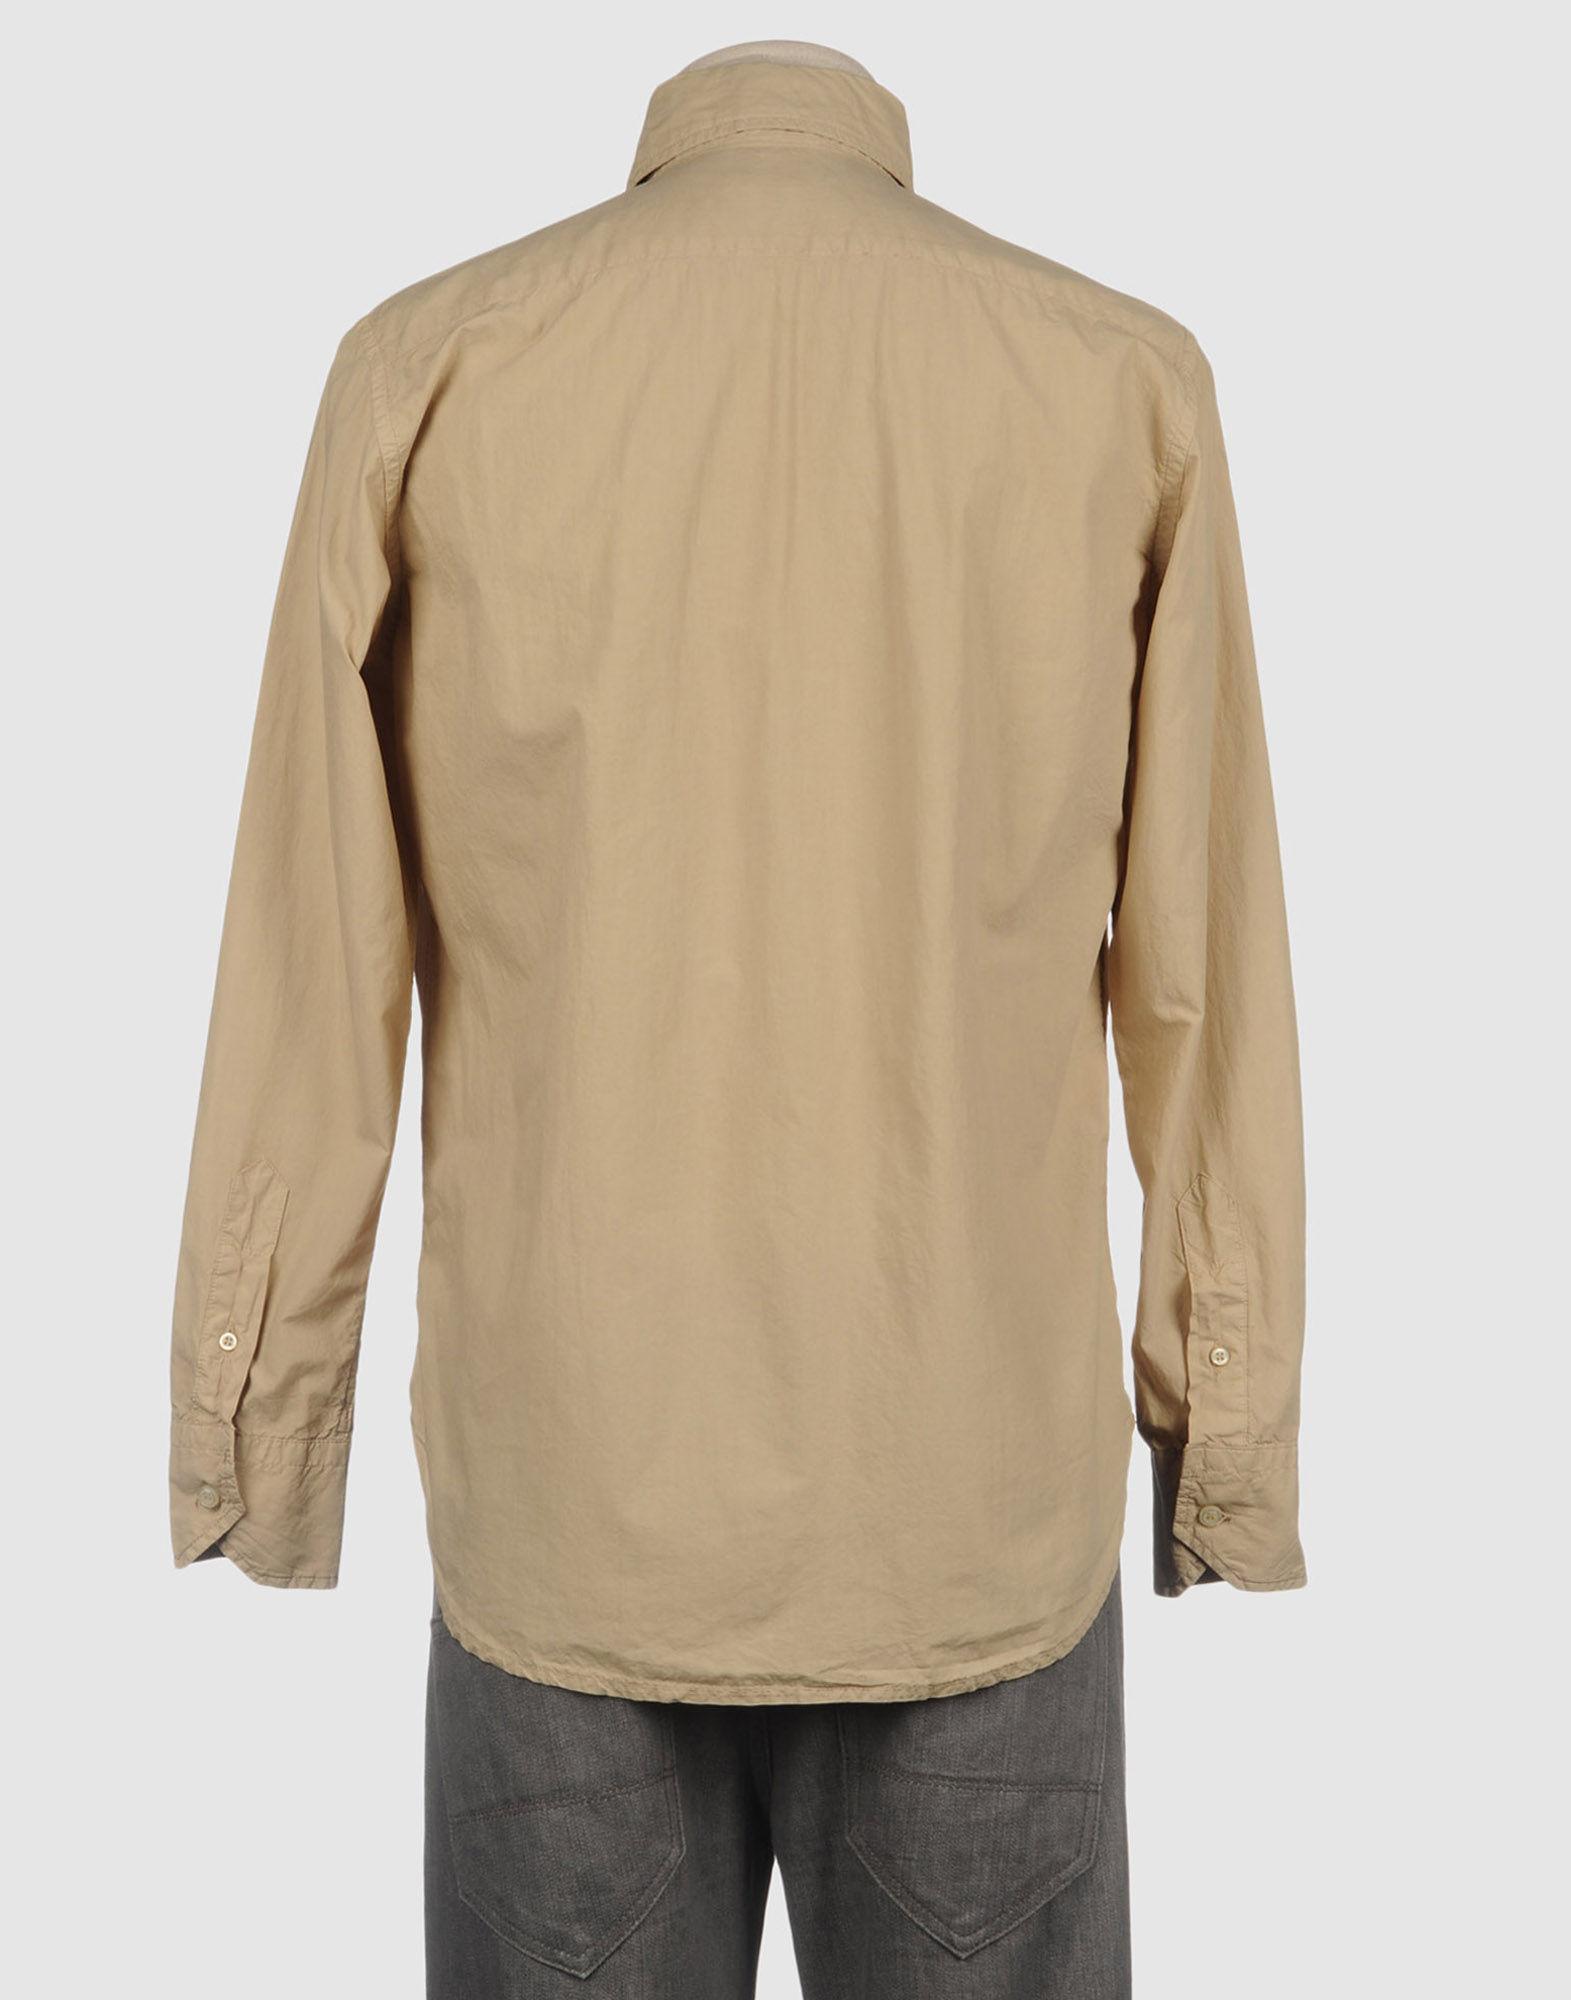 Mason 39 S Long Sleeve Shirt In Beige For Men Lyst